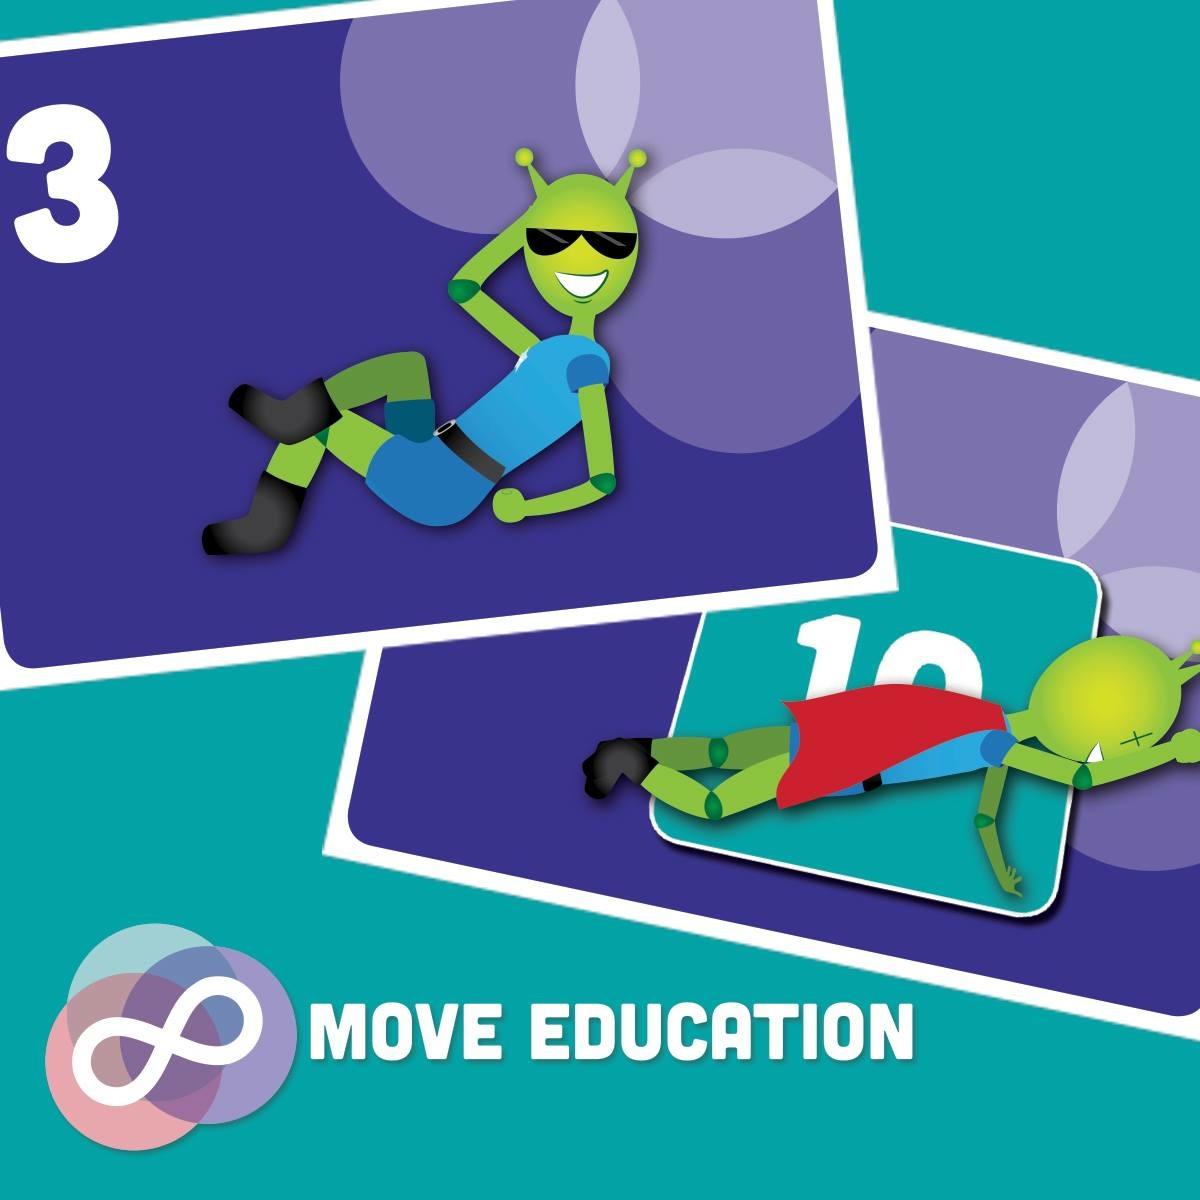 move education